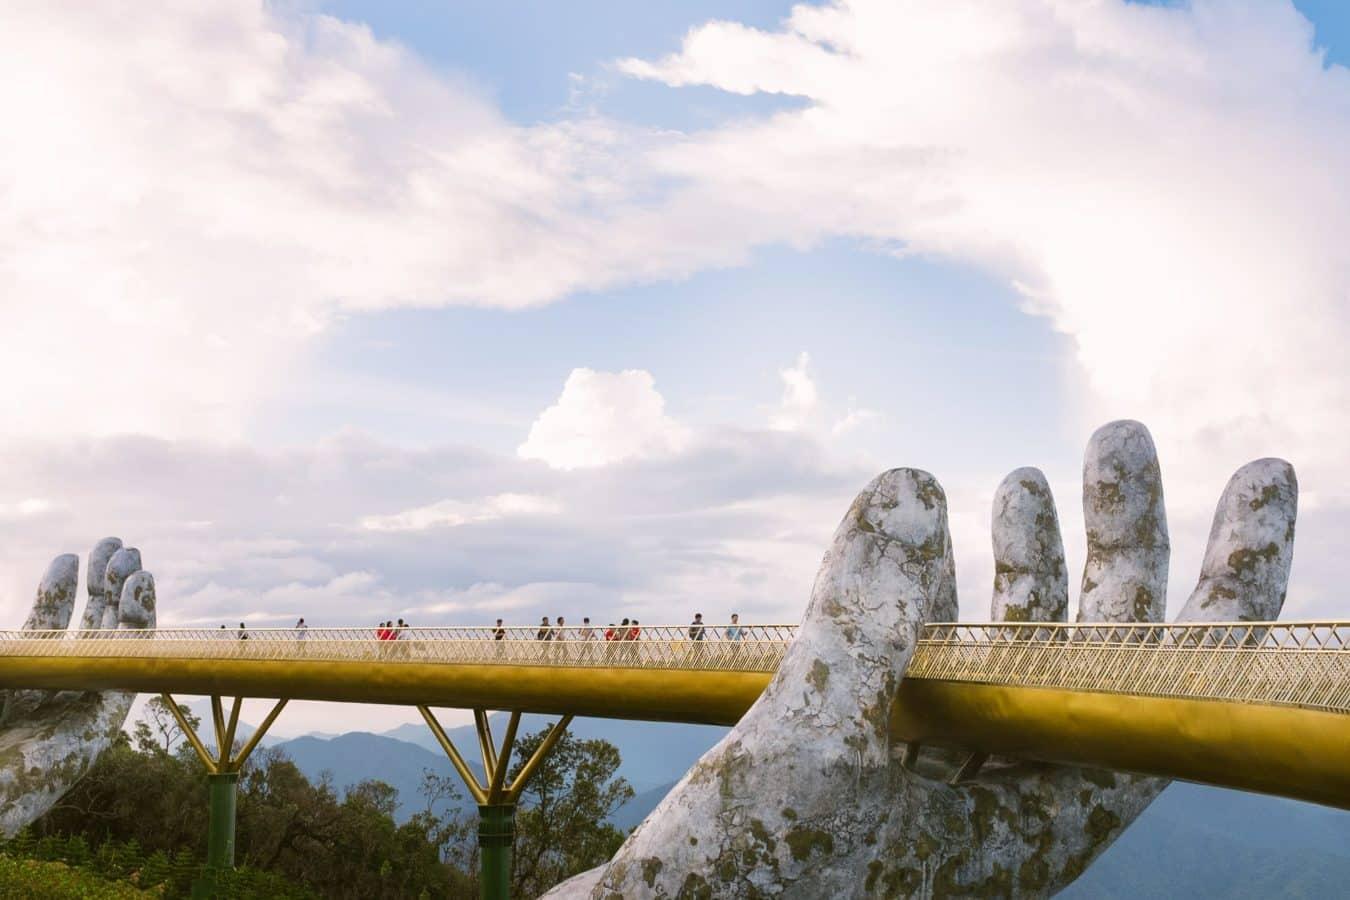 The Golden Bridge or 'Hand Bridge'